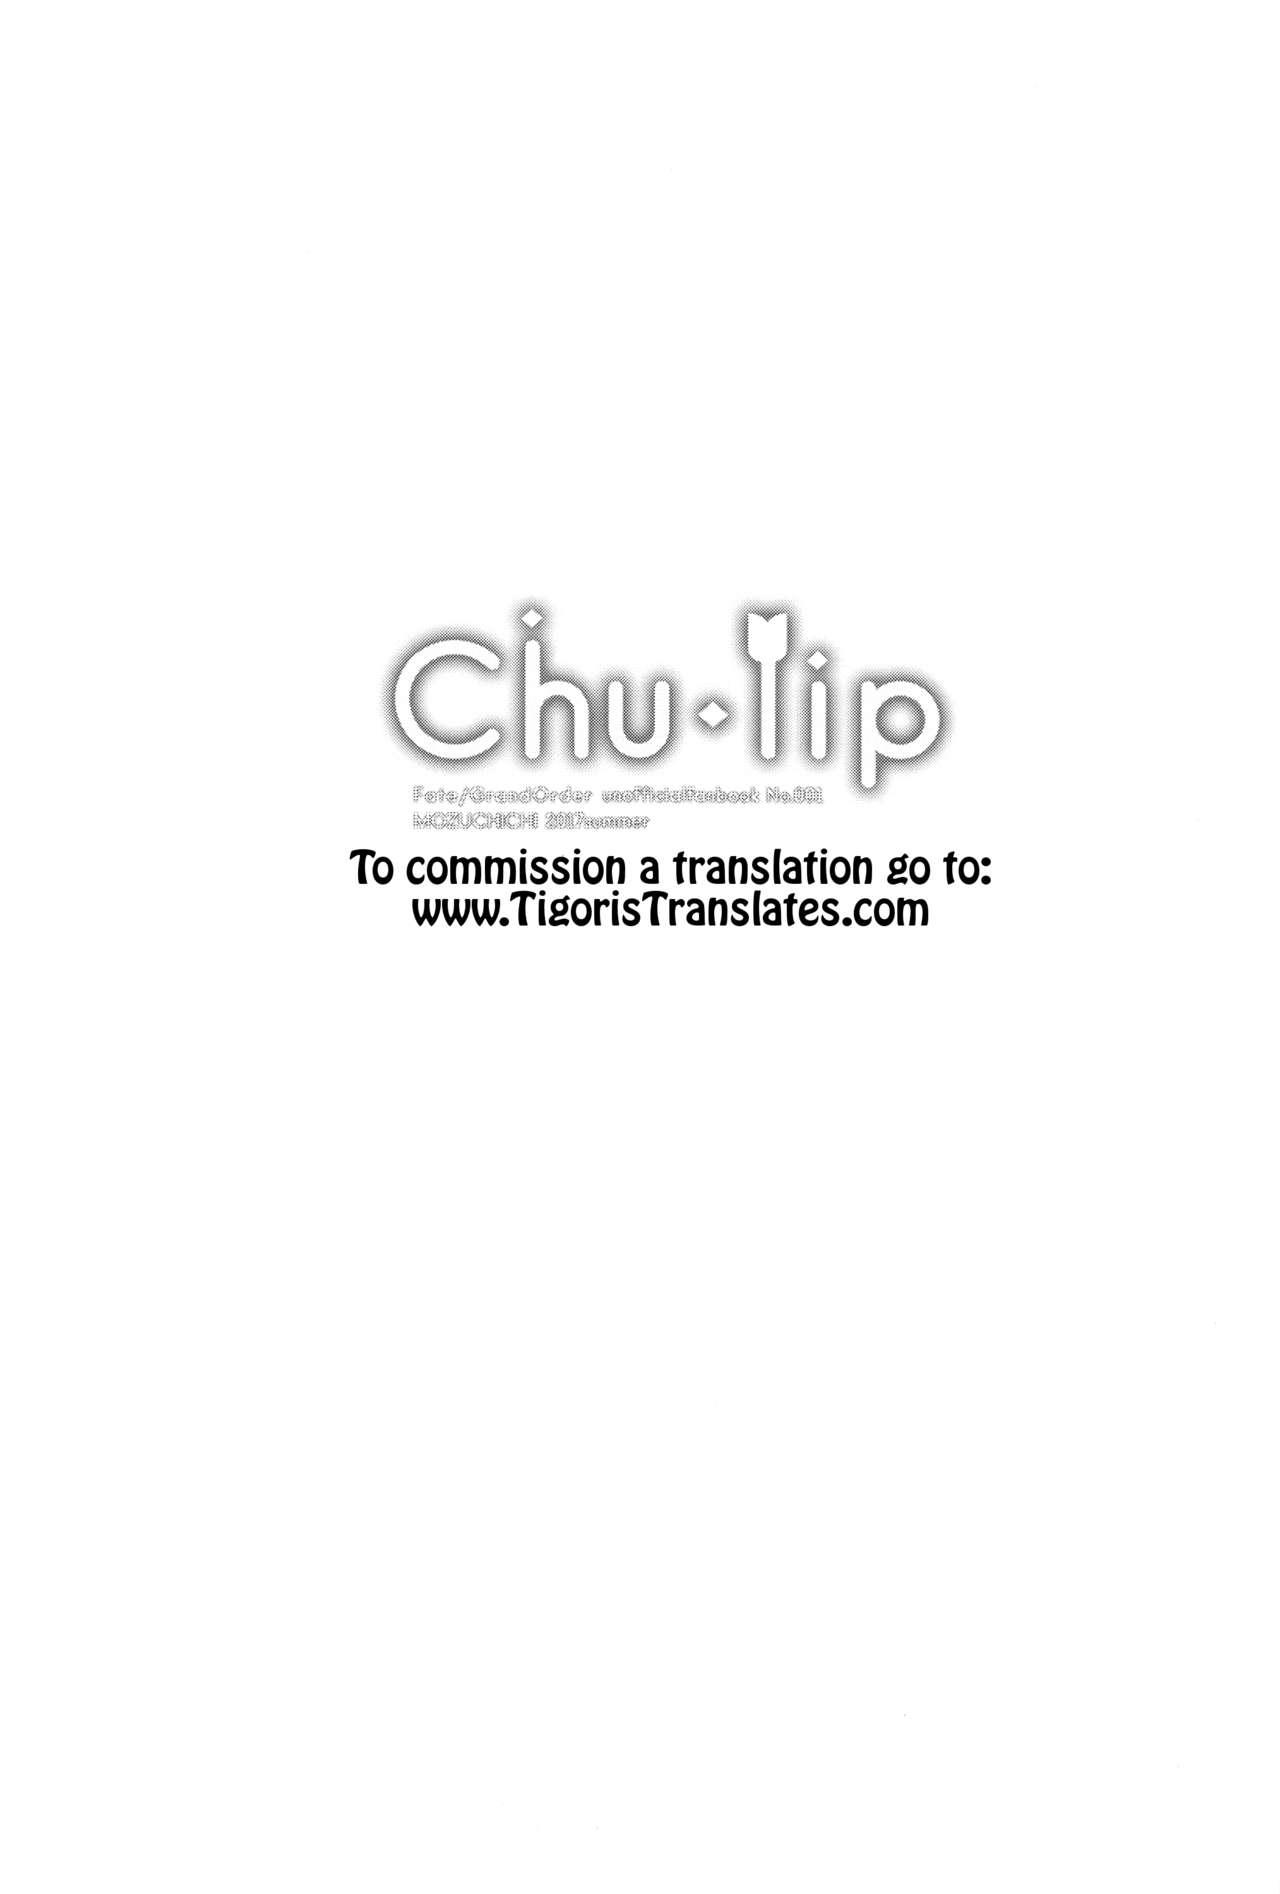 Chu-lip 1